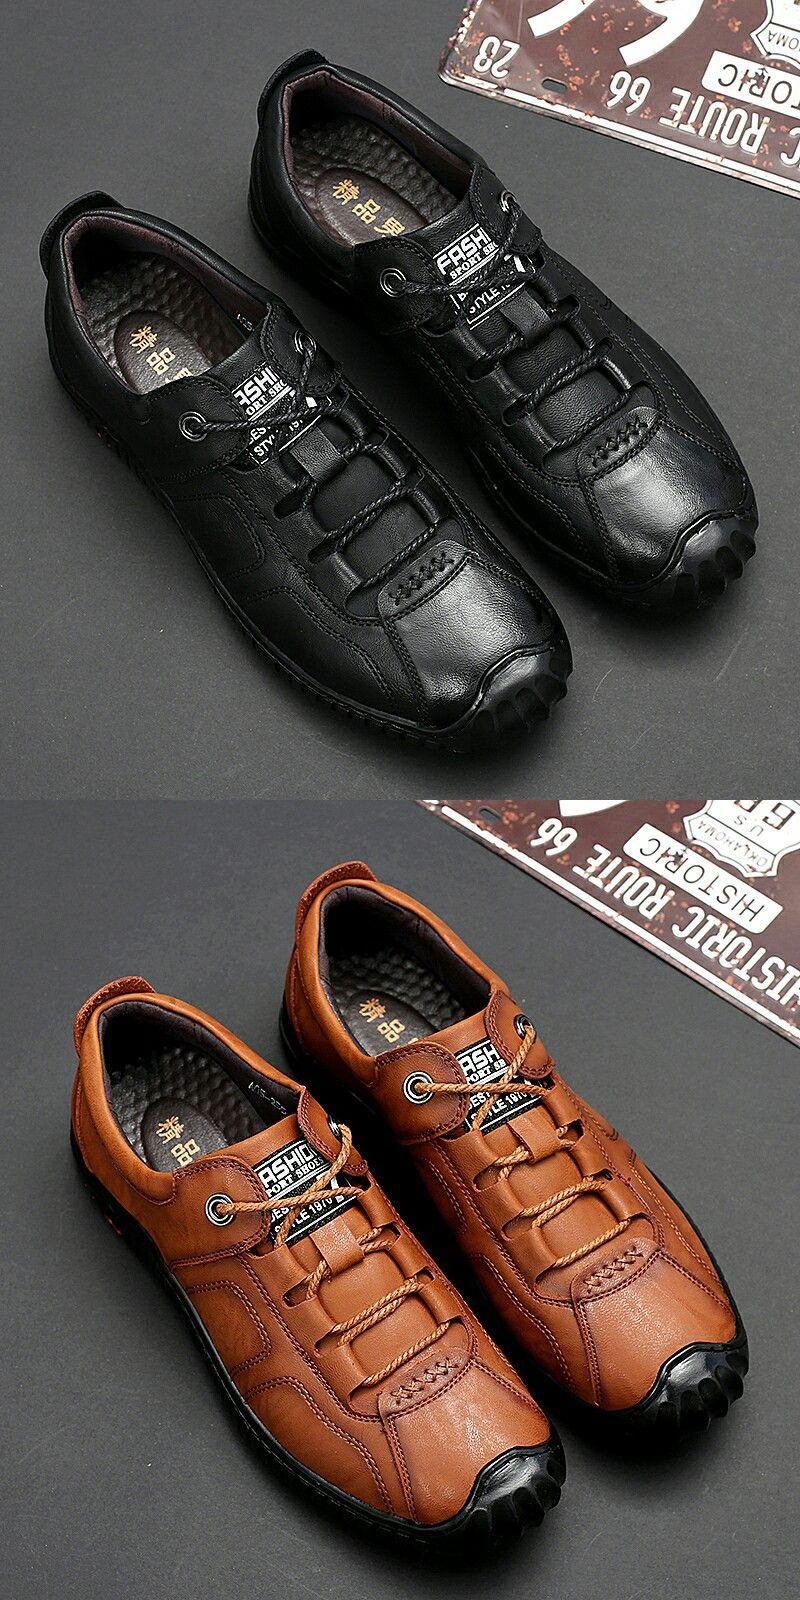 Prelesty Luxury Leather Men Dress Shoes Brogues Derbies